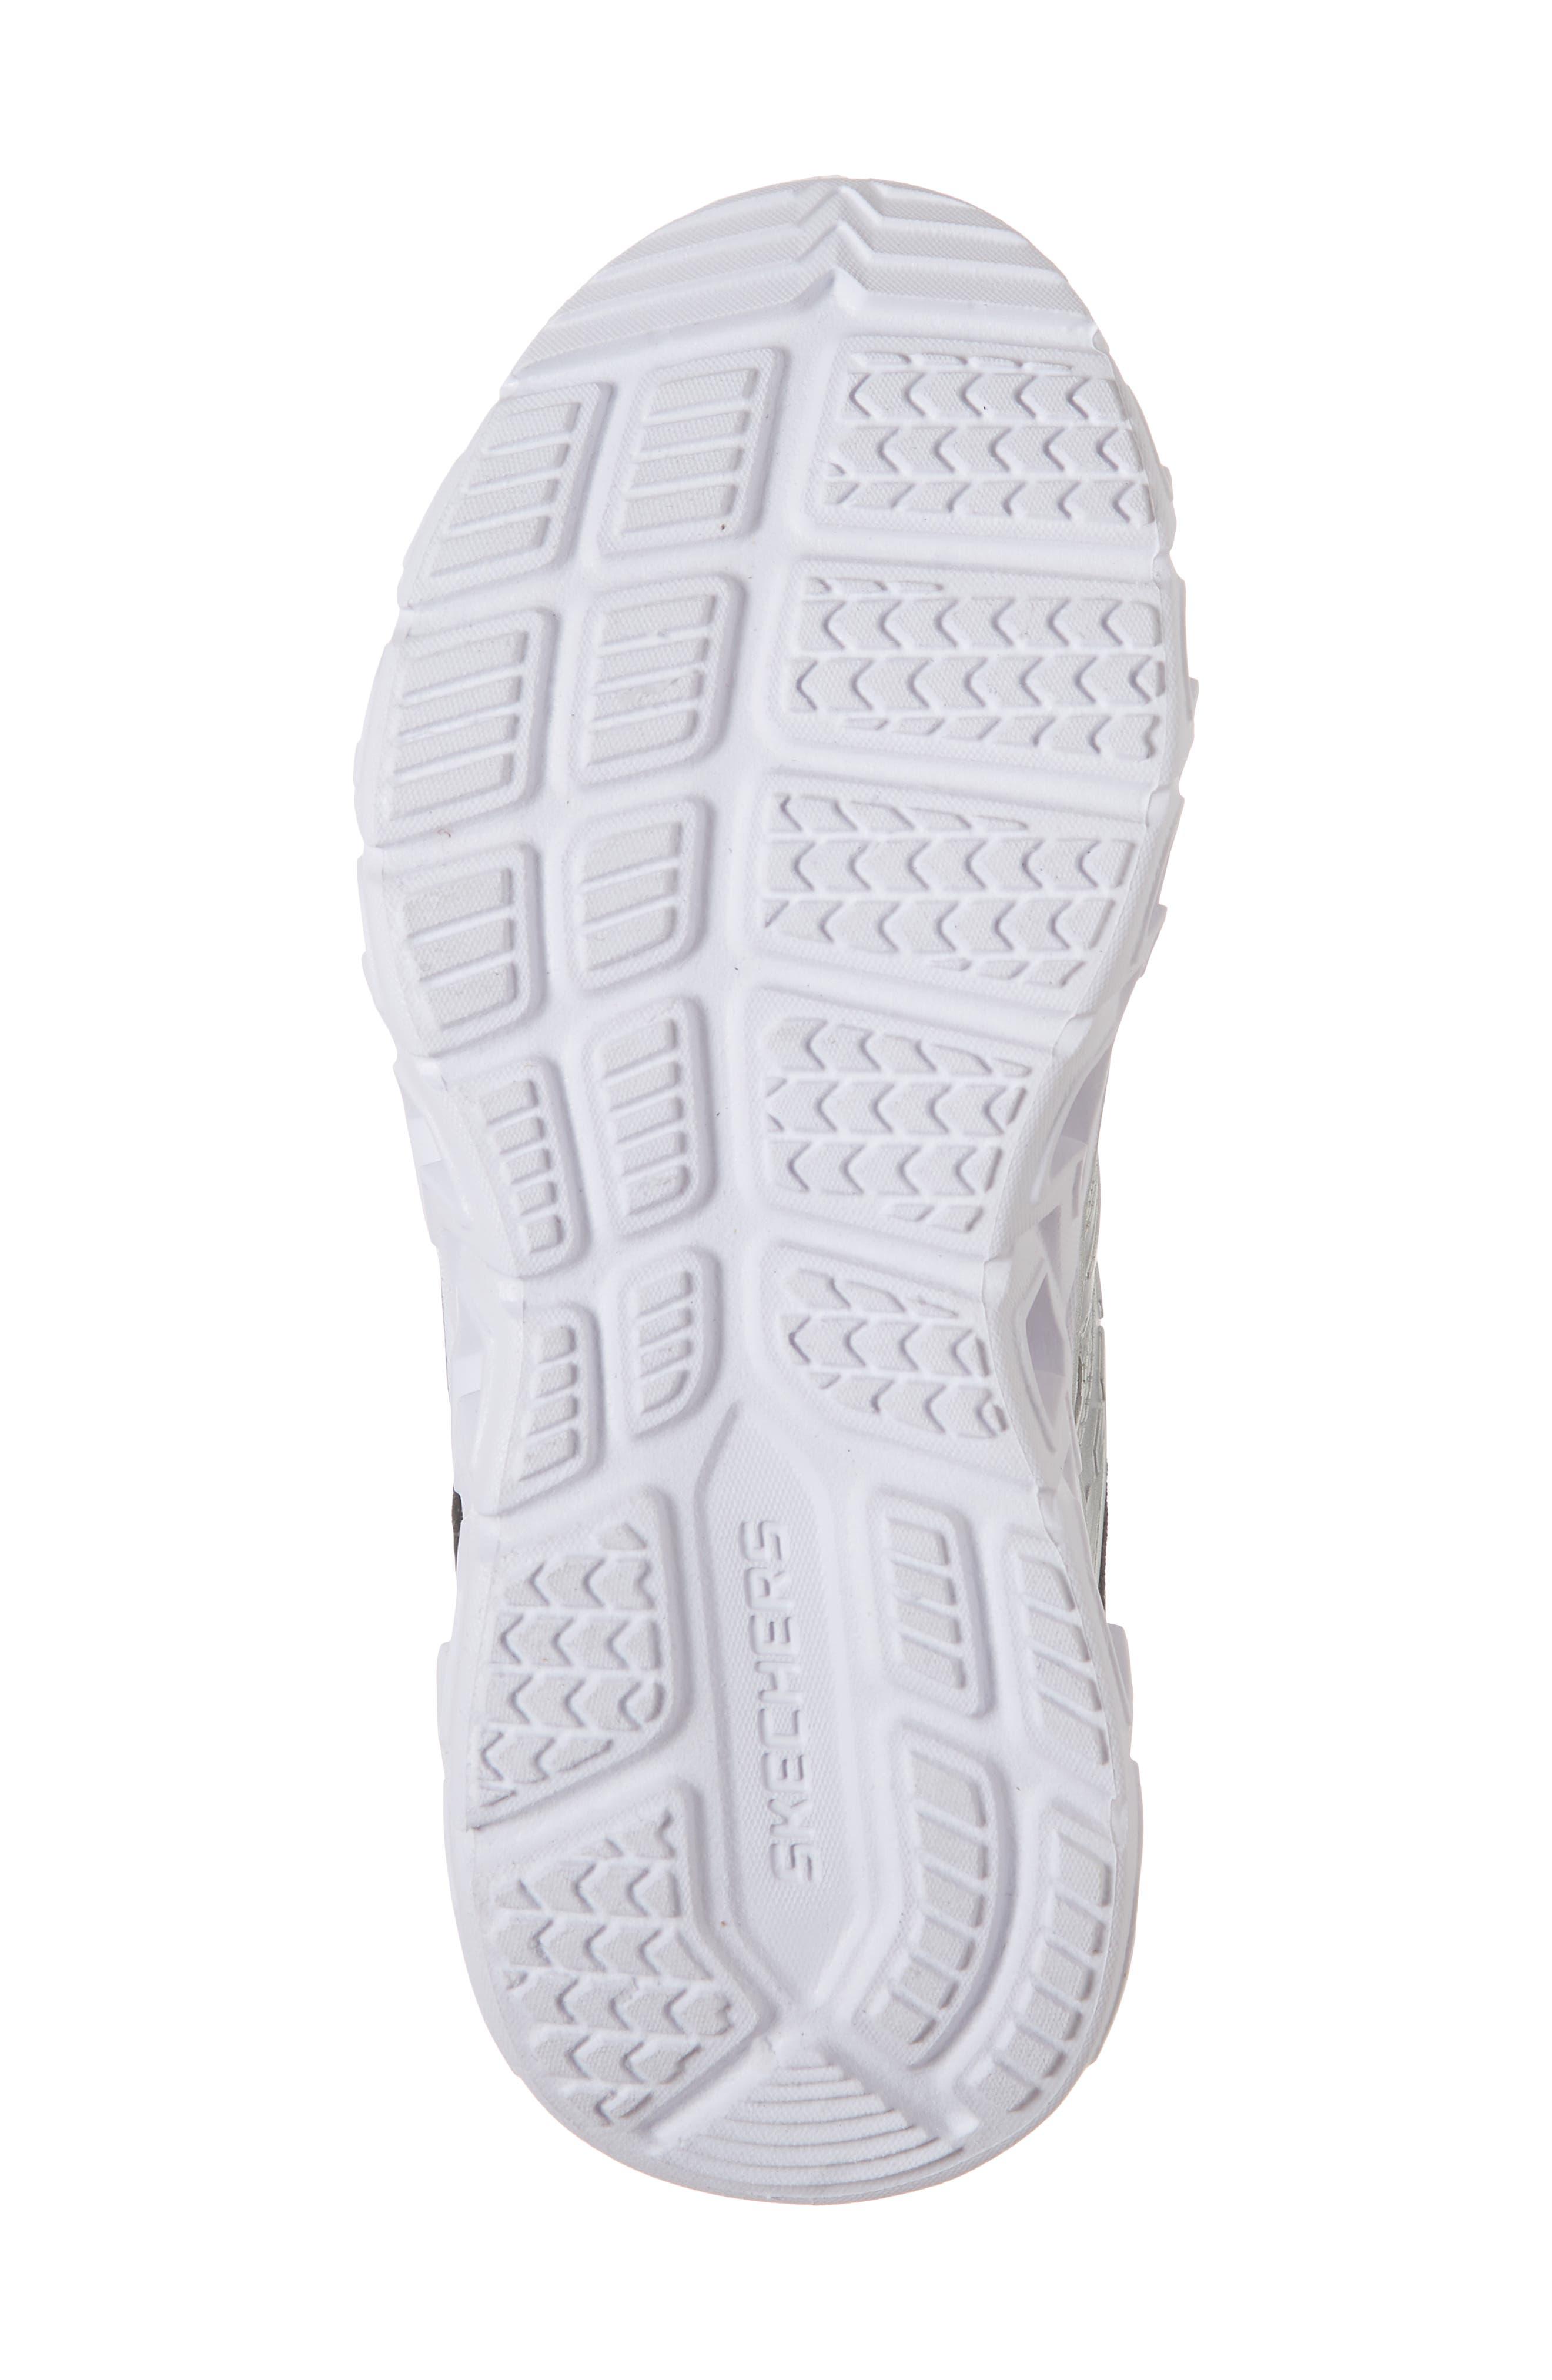 Hypno-Flash 2.0 Sneakers,                             Alternate thumbnail 4, color,                             Lime/ Black